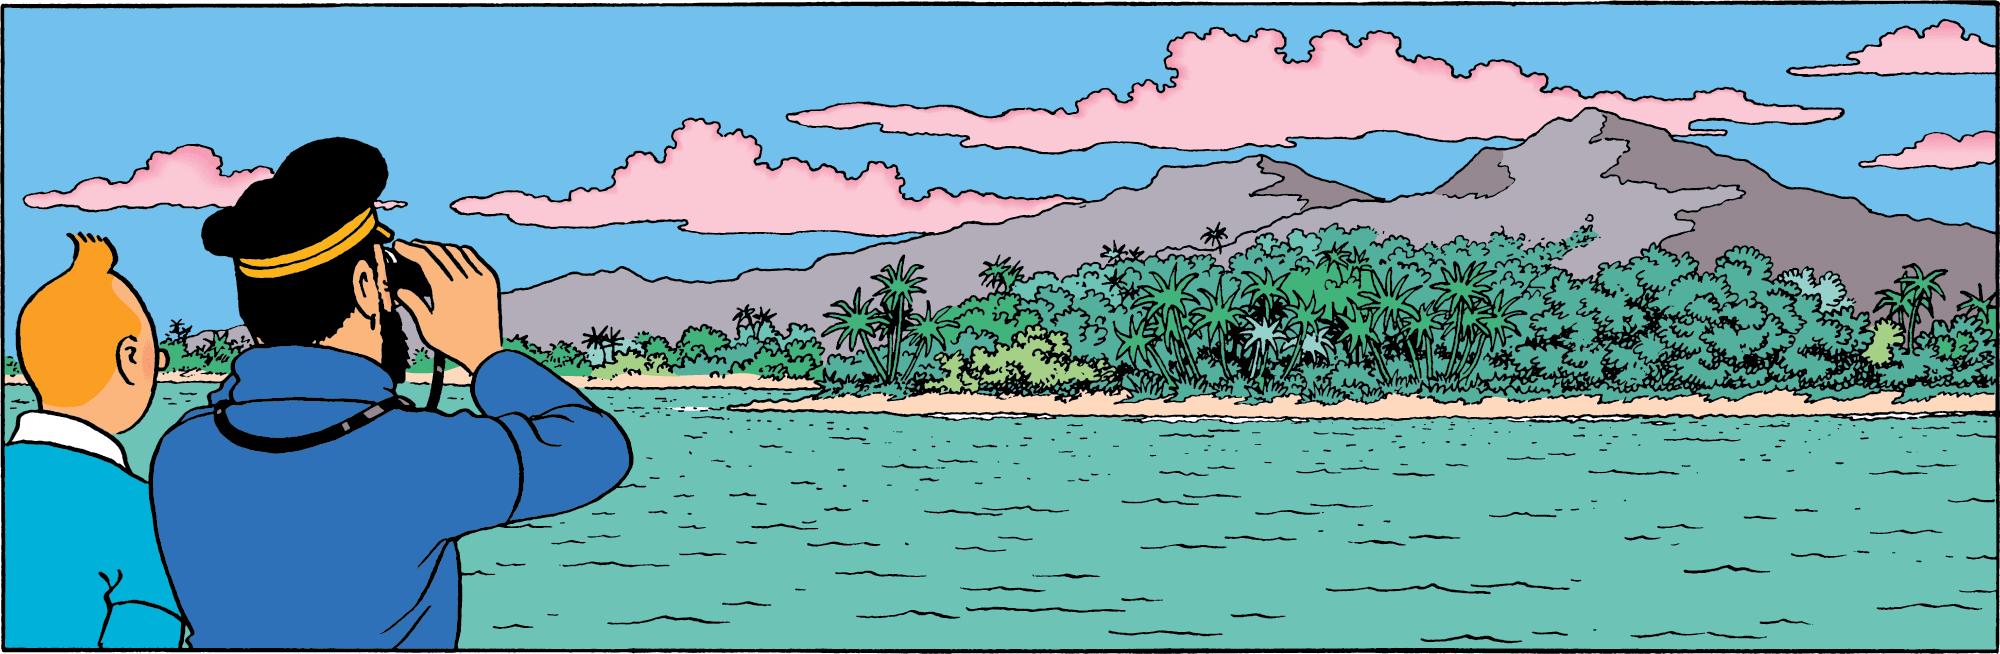 Red Rackham's Treasure, Haddock and Tintin